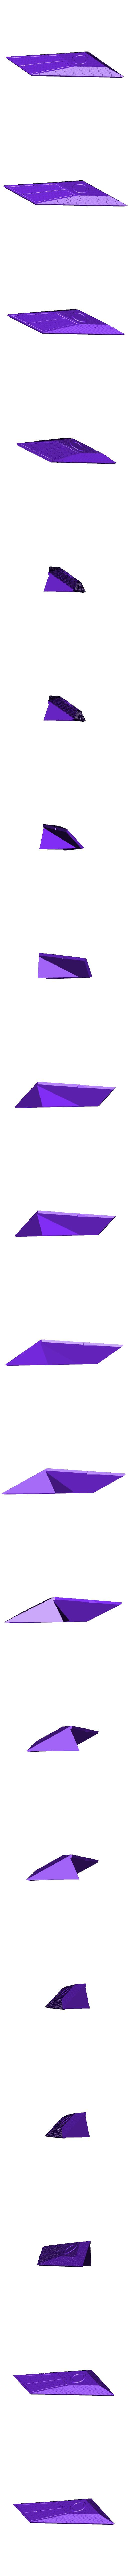 06.ShuttleBay.stl Download STL file Anubis • 3D print template, sergusy